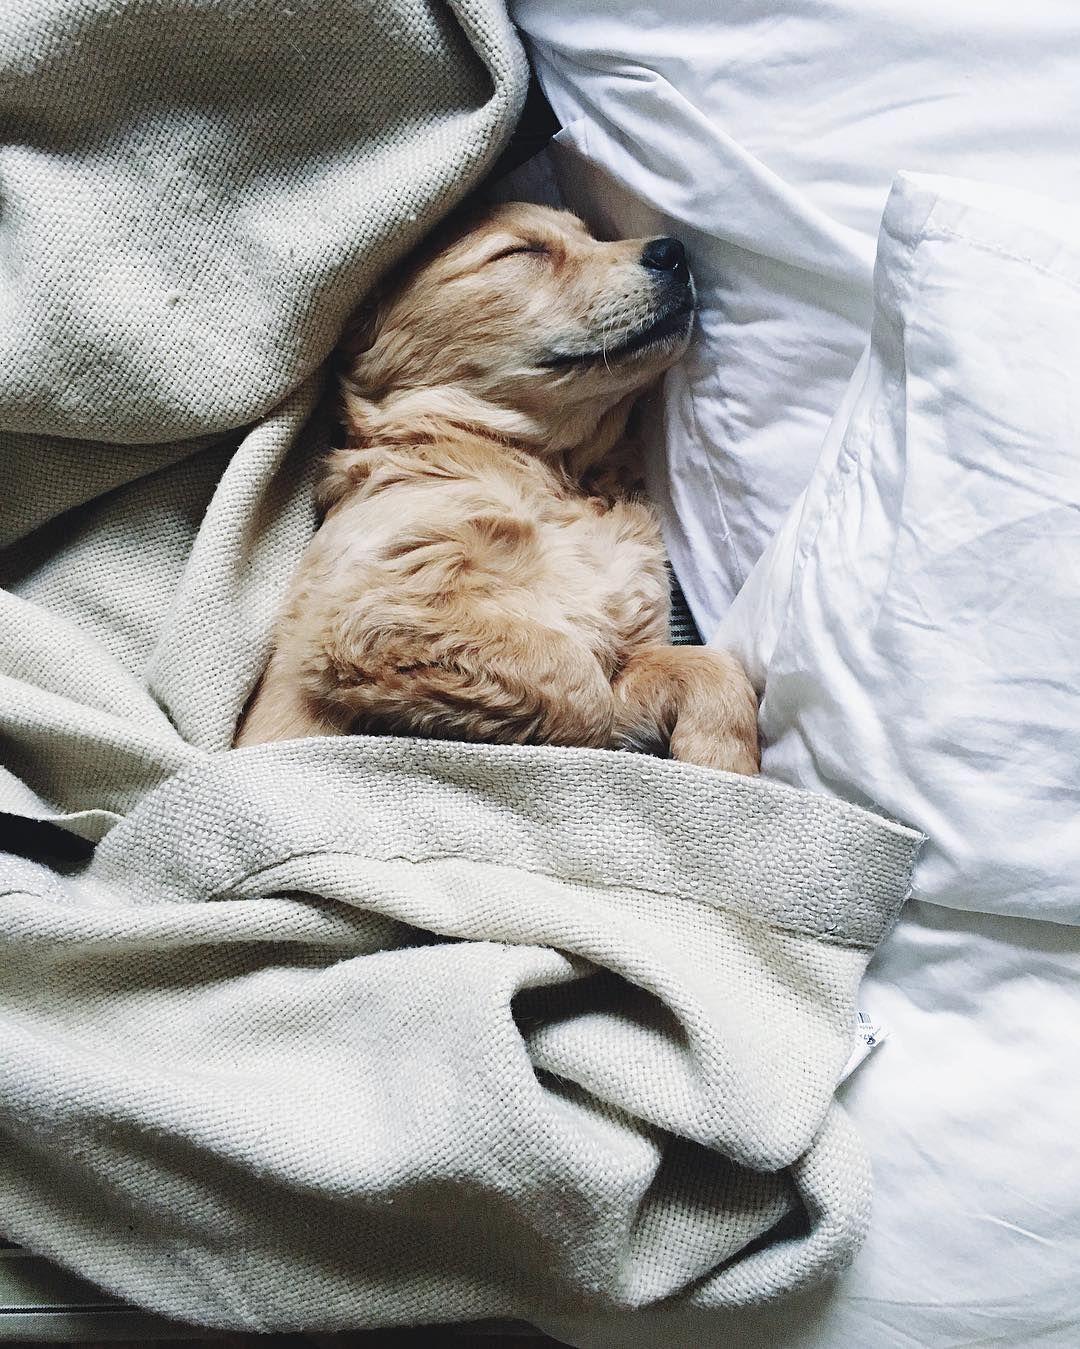 патологии доброе утро котик и собачка картинки здание